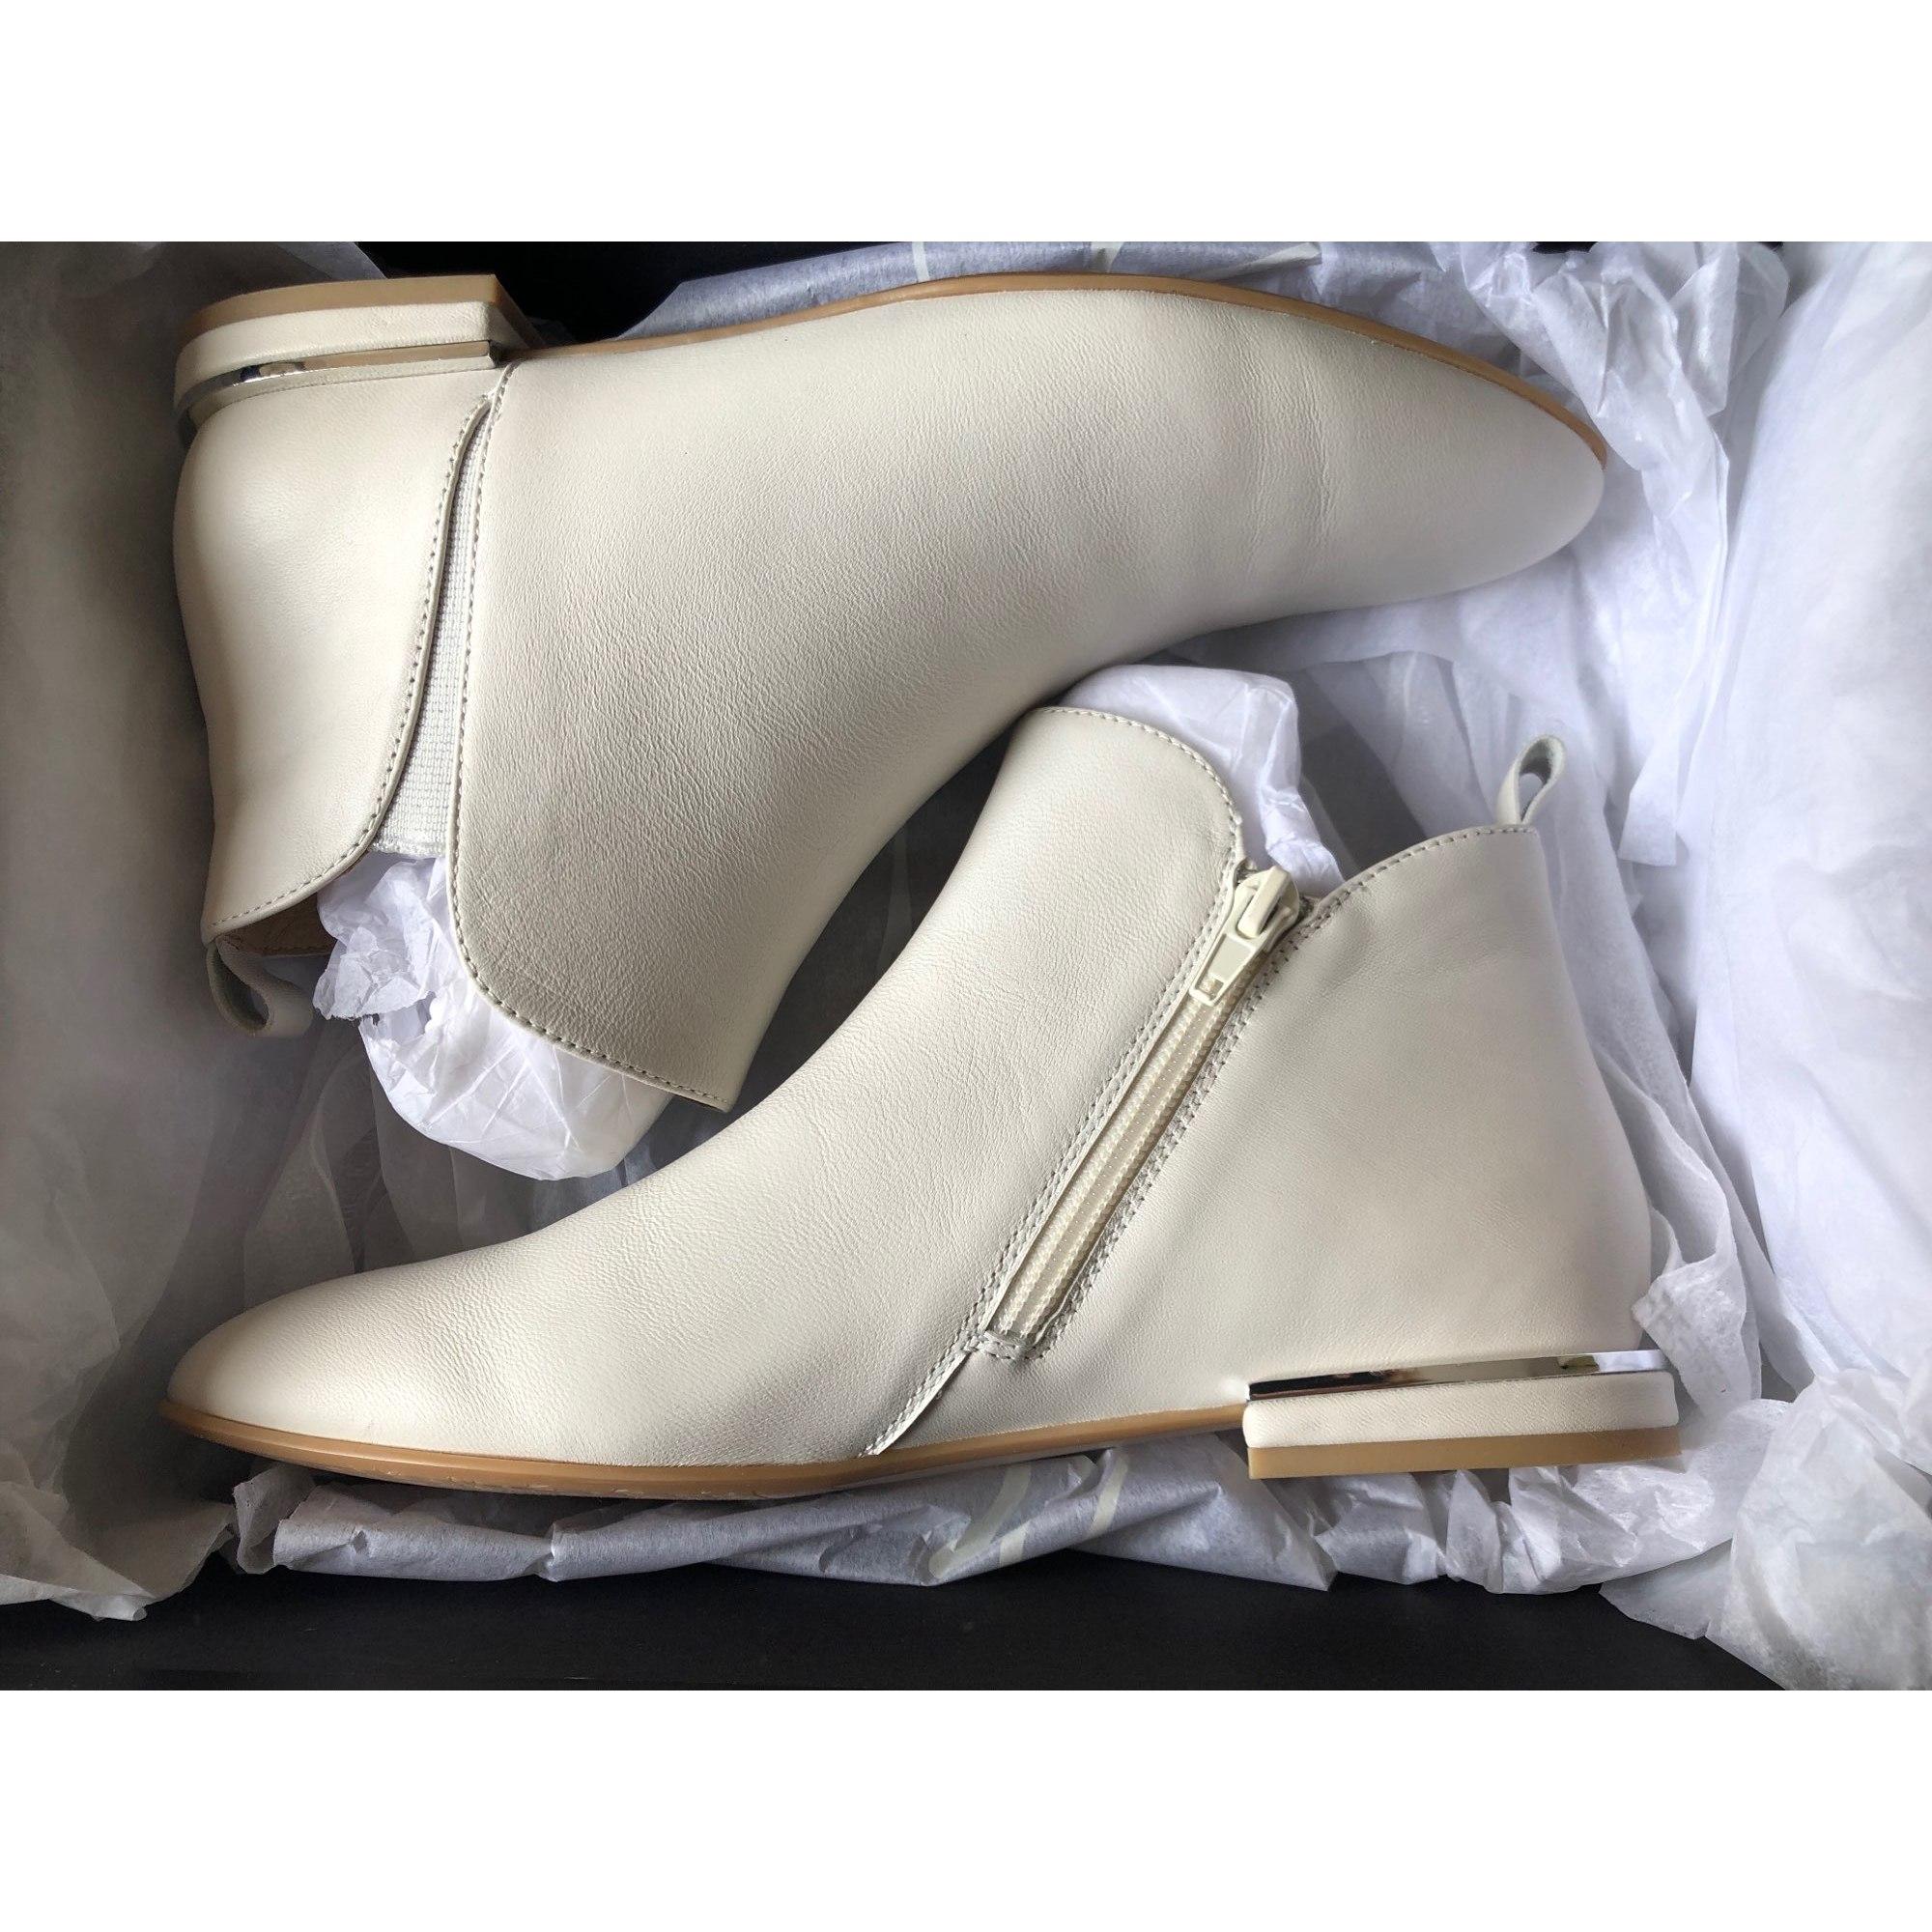 Bottines & low boots plates JB MARTIN Blanc, blanc cassé, écru